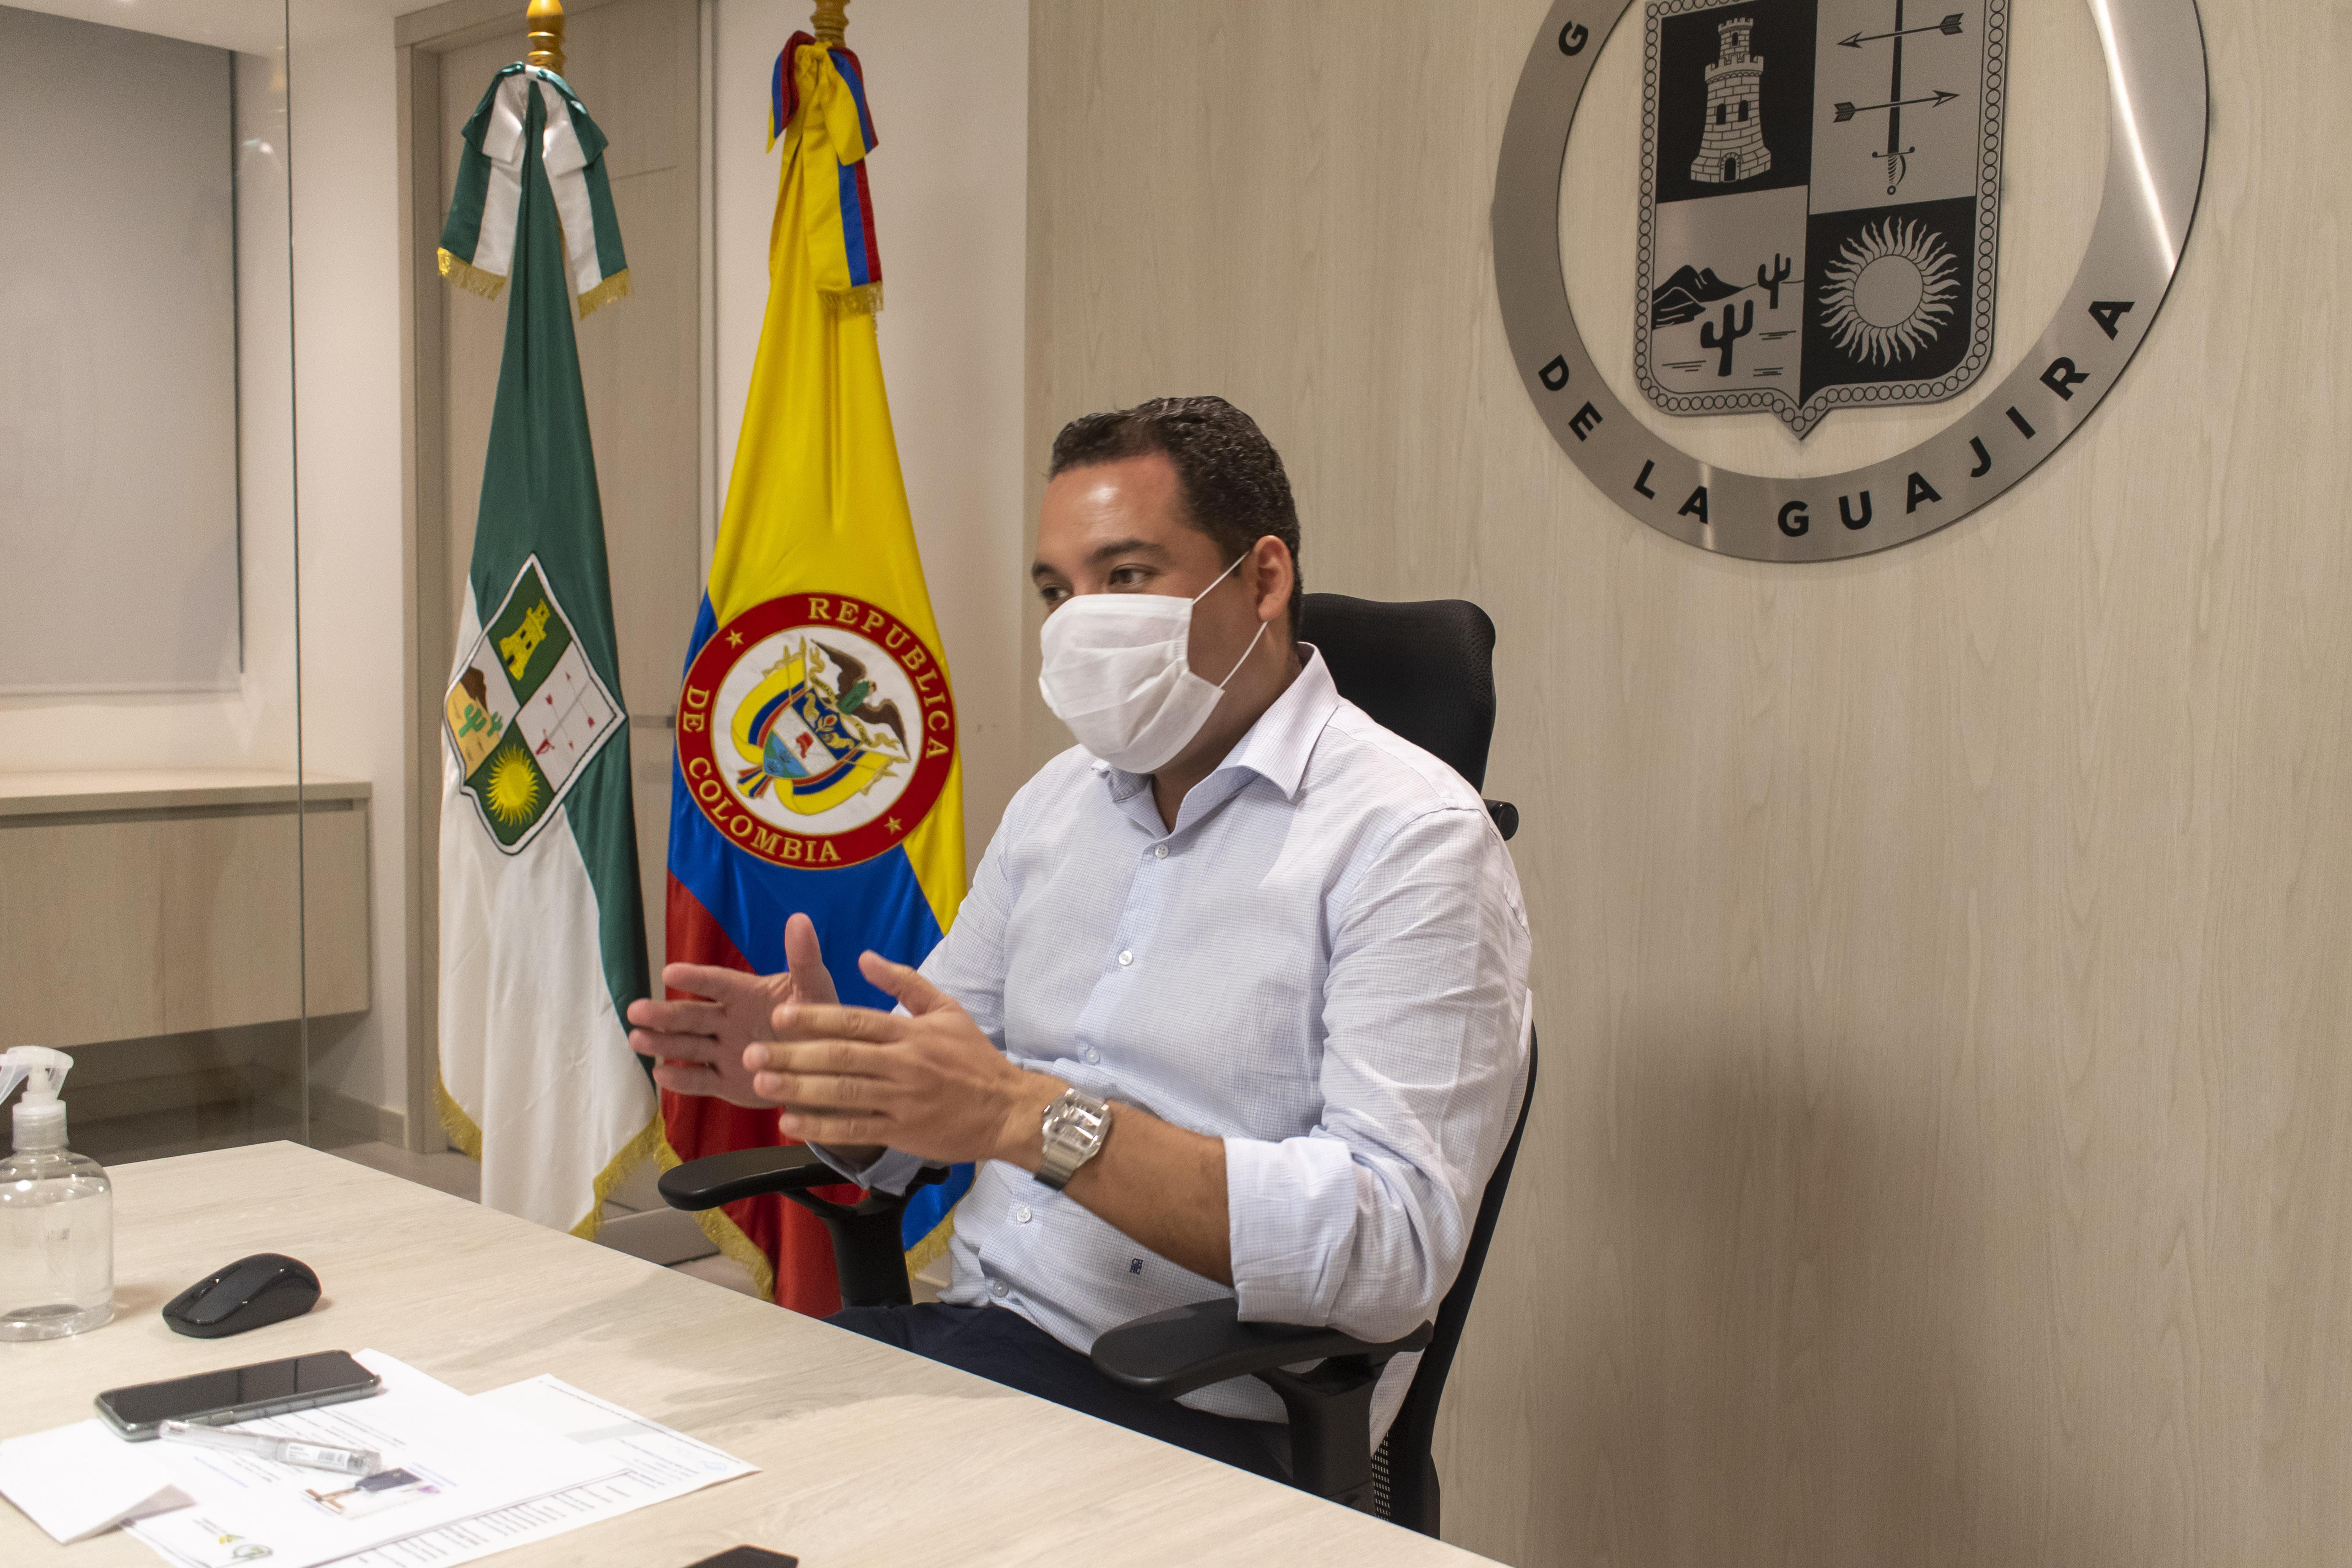 hoyennoticia.com, La Guajira cumplió con gratuidad de matricula a 10 mil 825 estudiantes